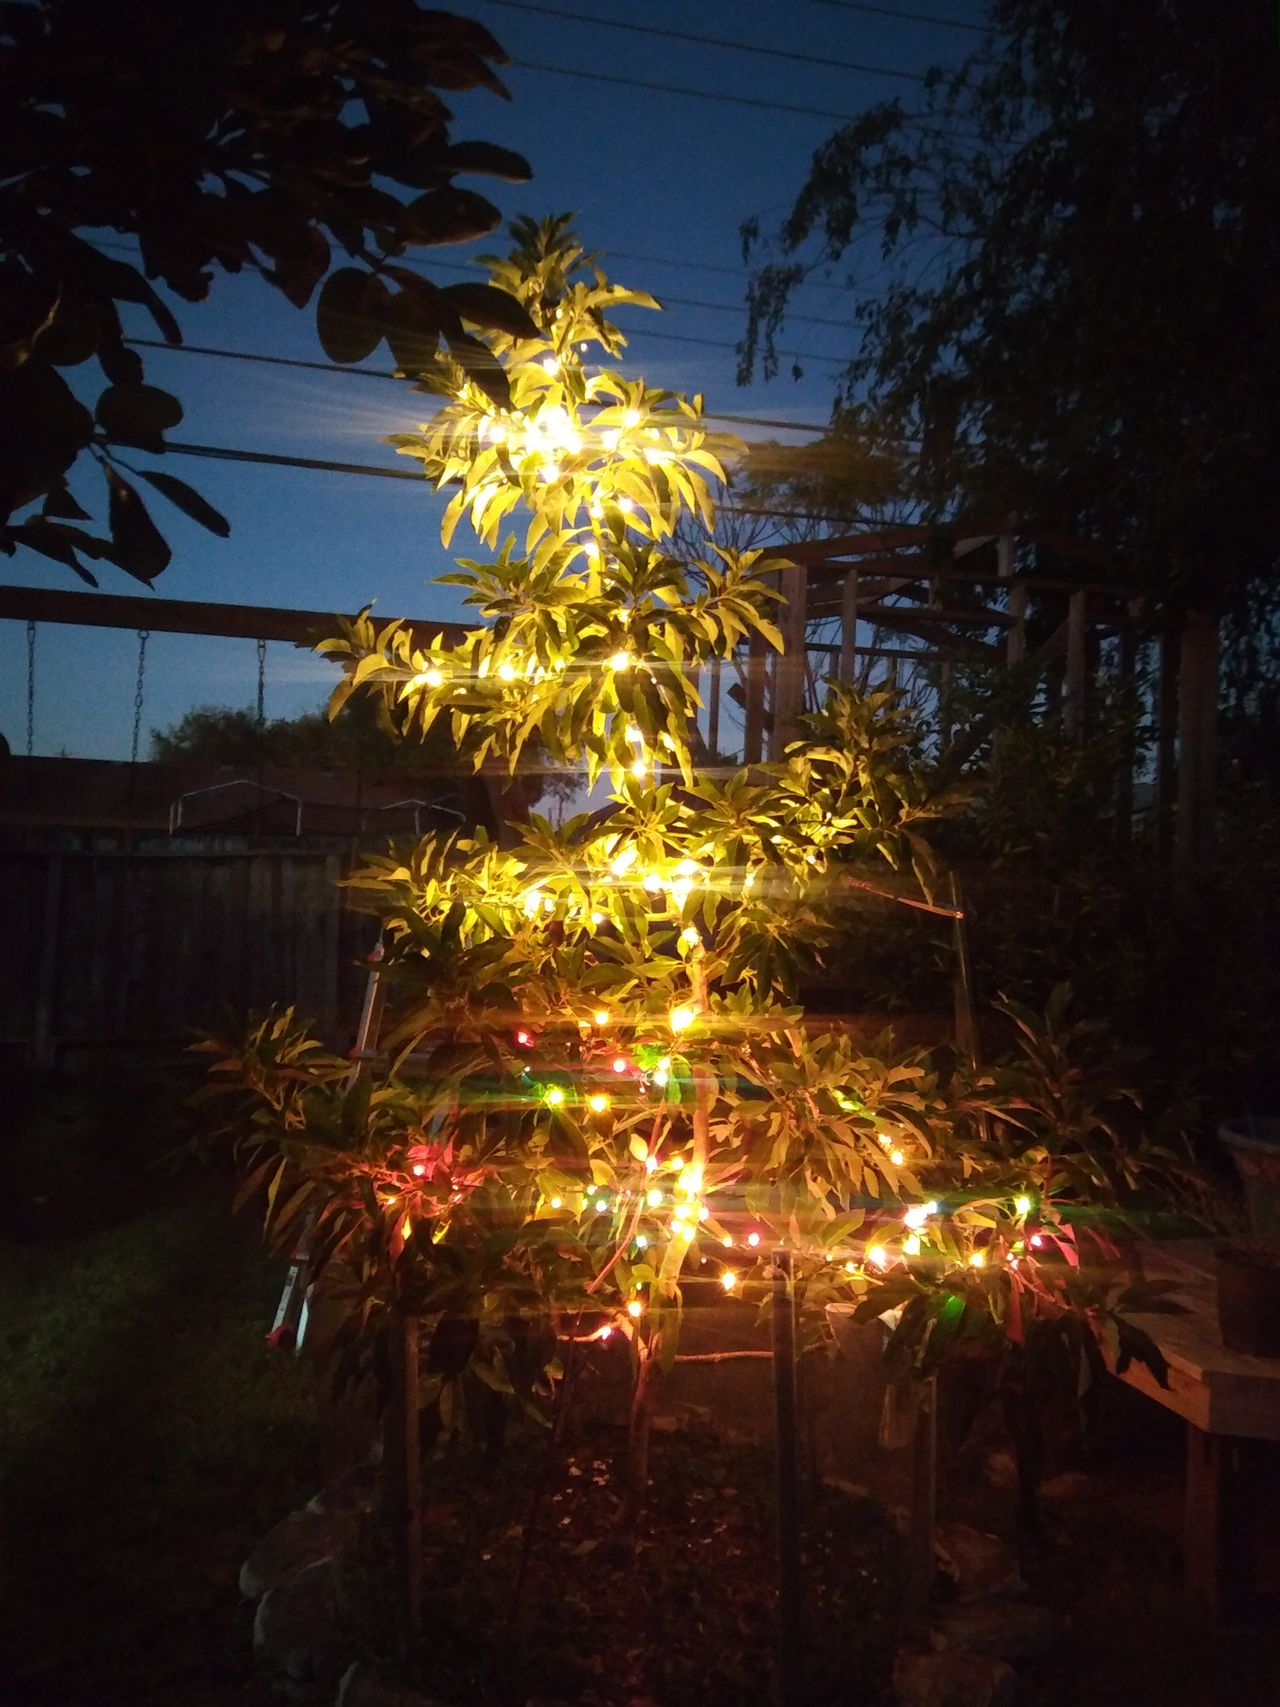 Avacado Tree avacado tree in lights Tree Celebration Illuminated Nature Outdoors Christmas Lights Night Holiday - Event No People